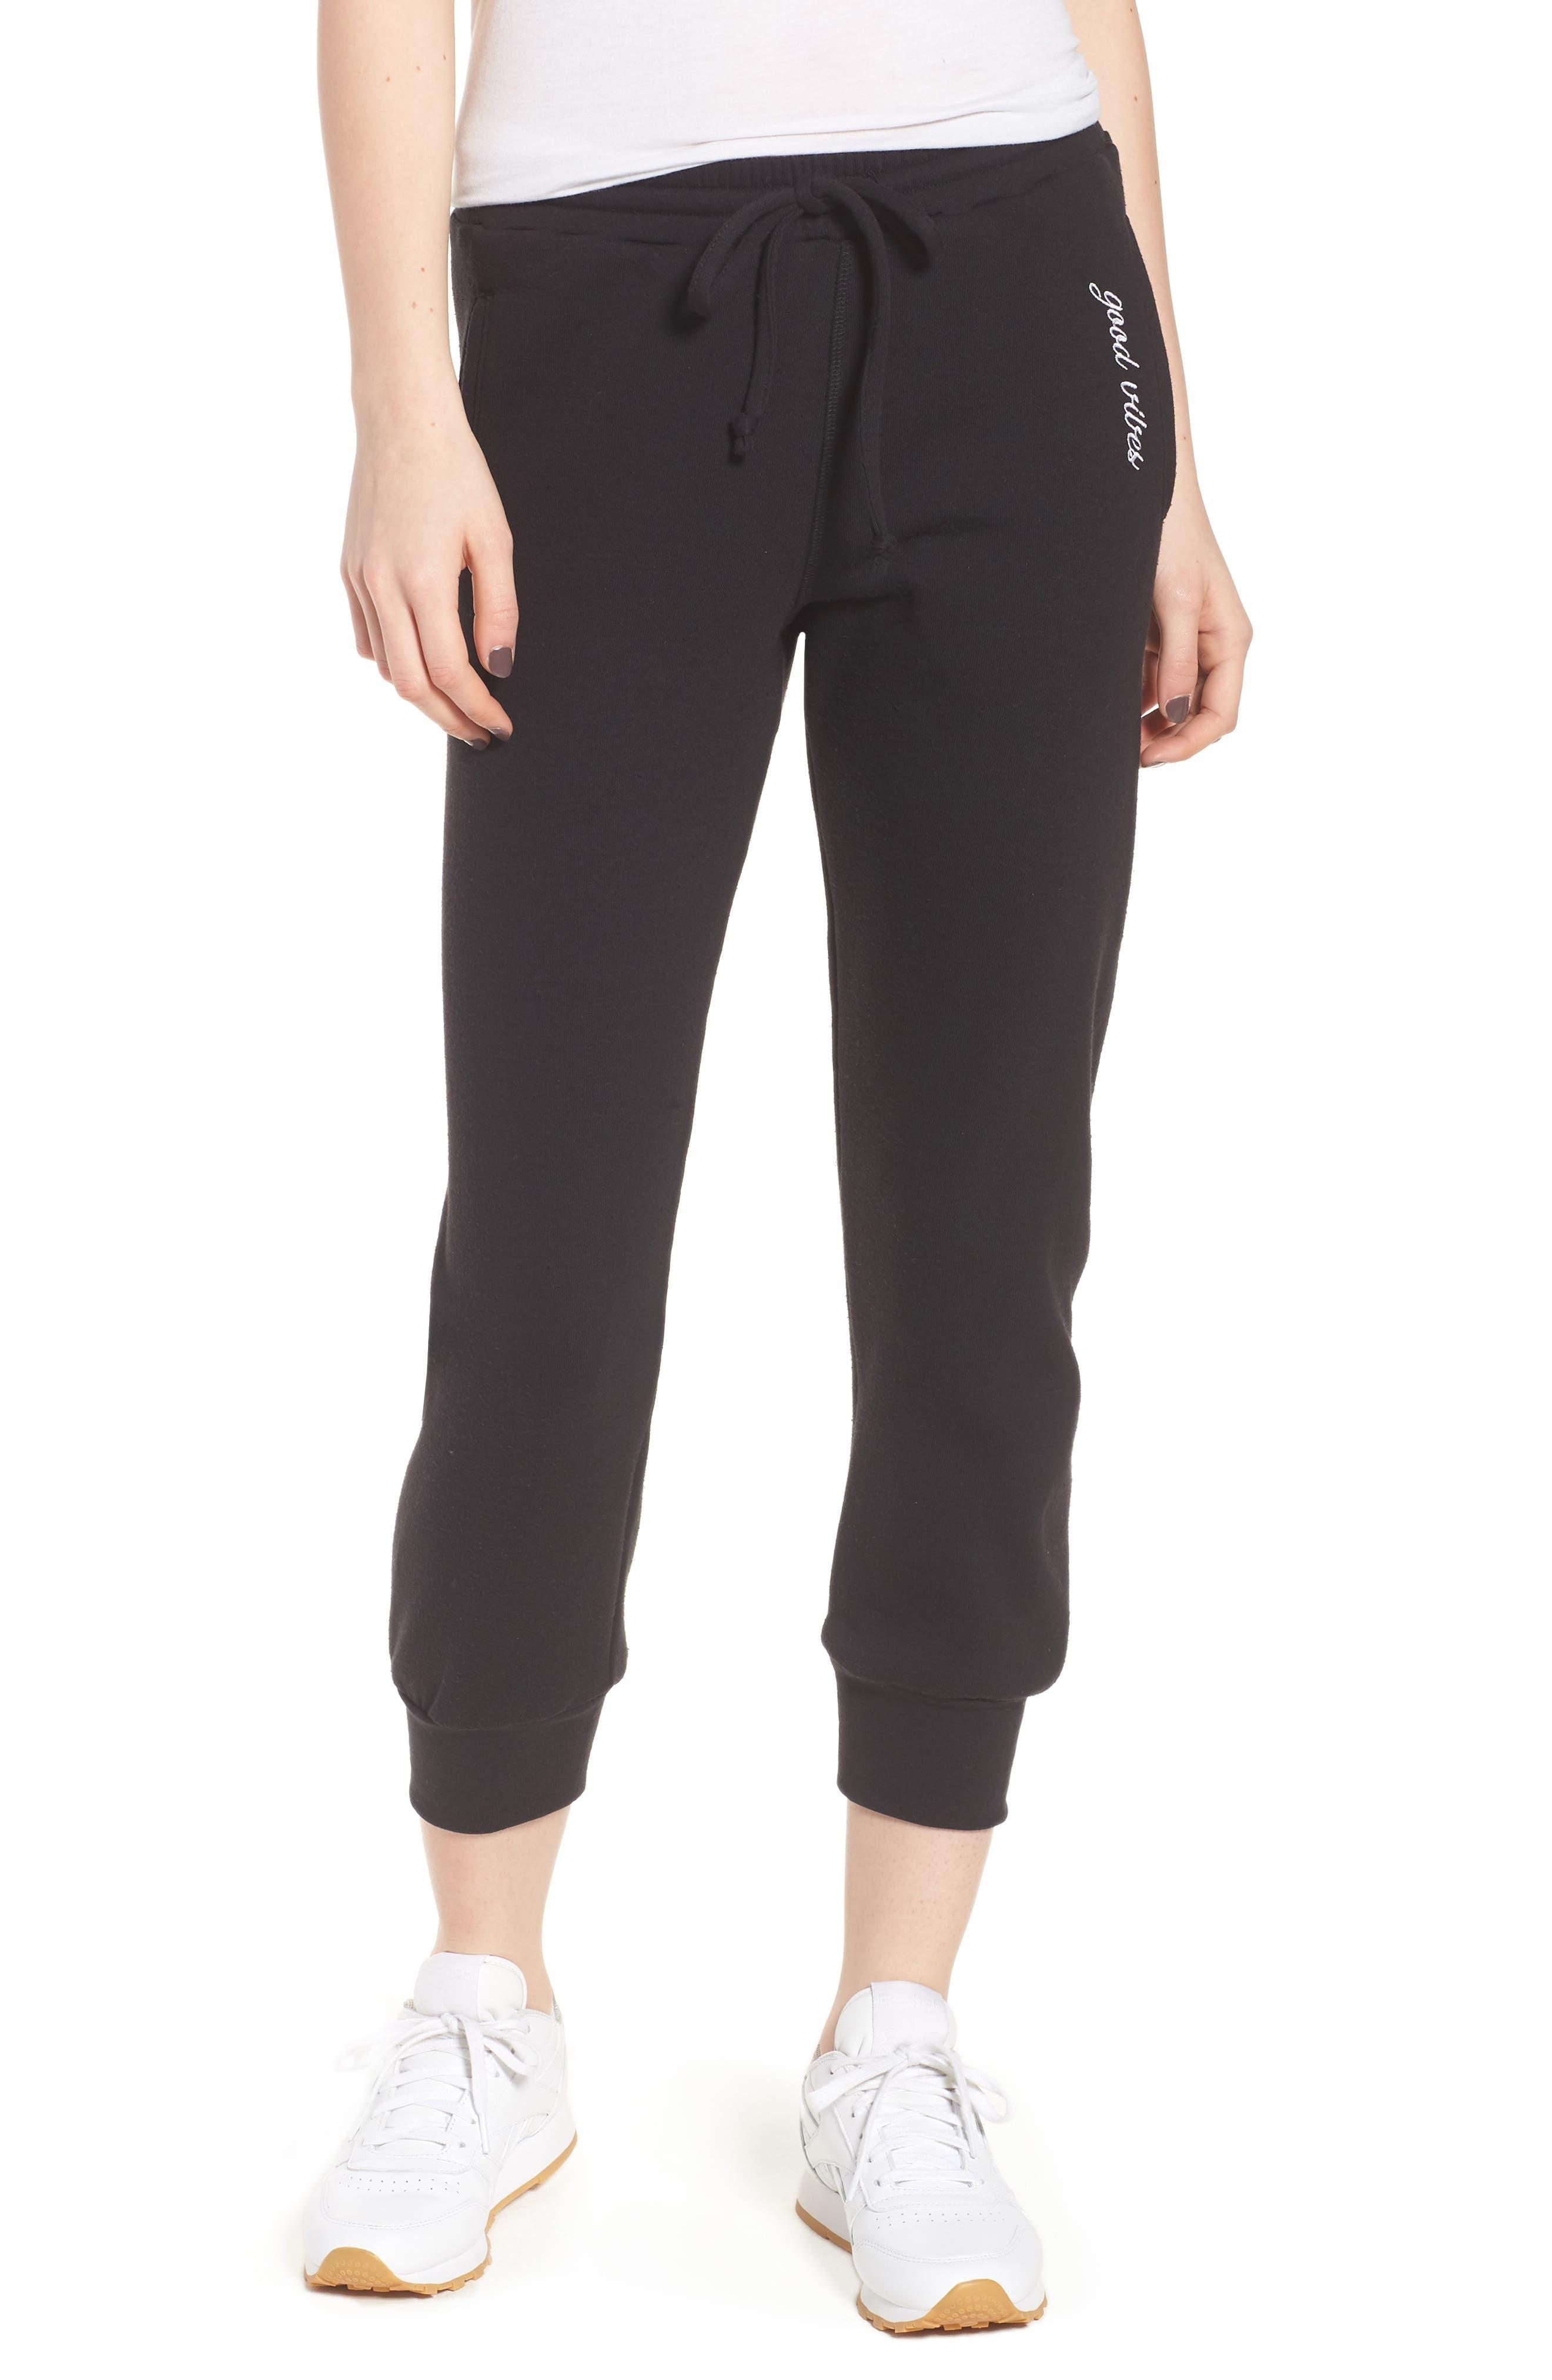 Cambridge Good Vibes Sweatpants,                         Main,                         color, 001